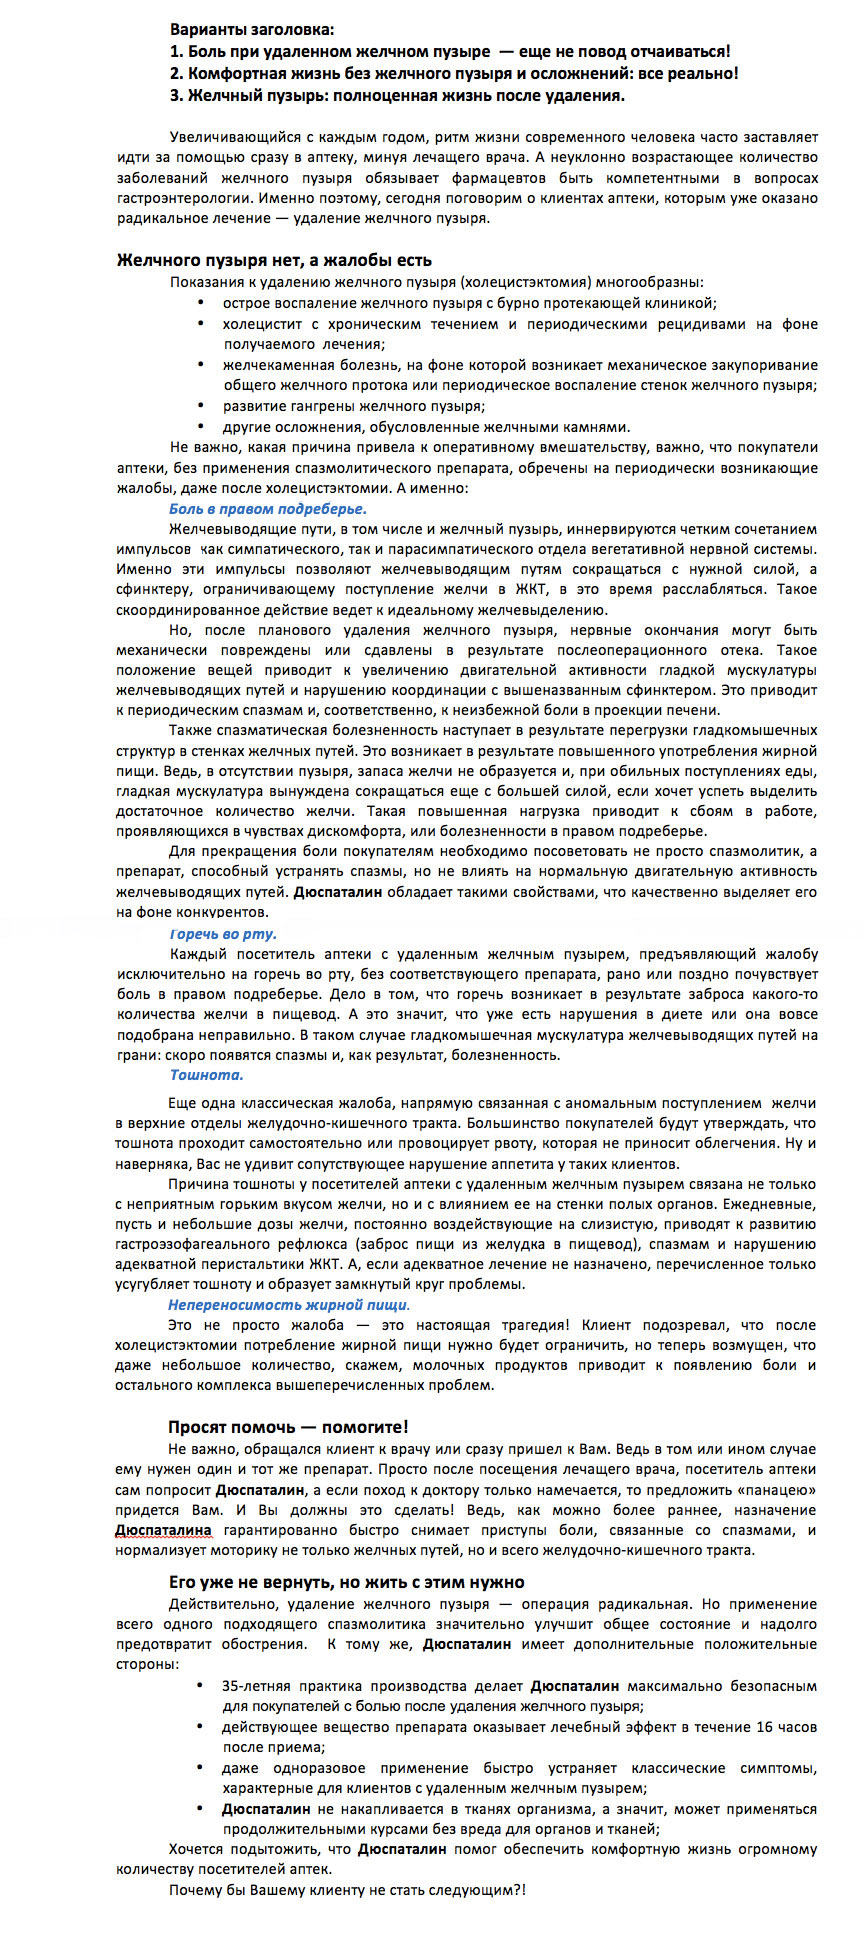 Легкая статья в журнал о препарате Дюспаталин